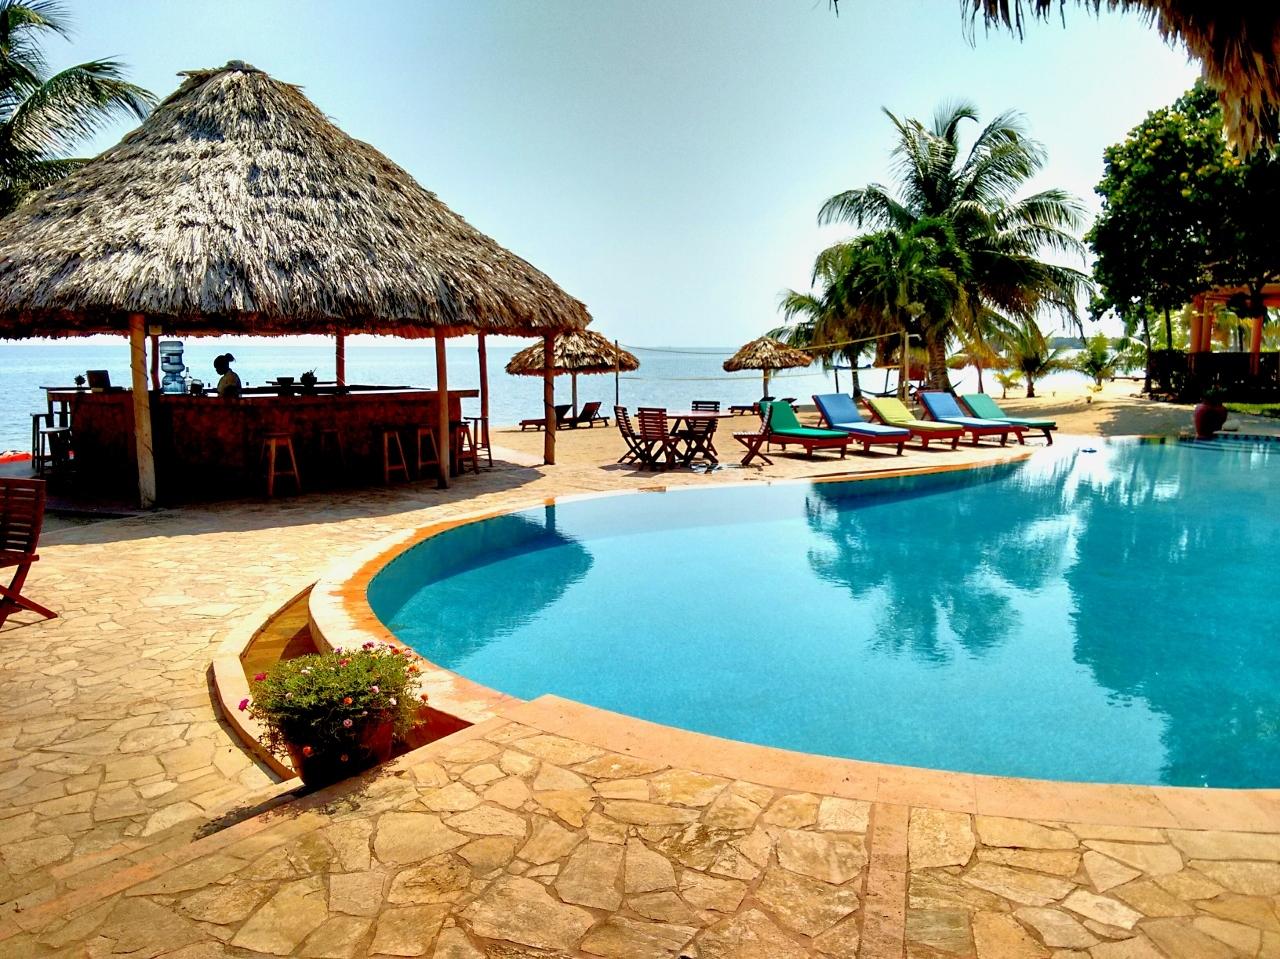 The pool and beach bar at belizean dreams